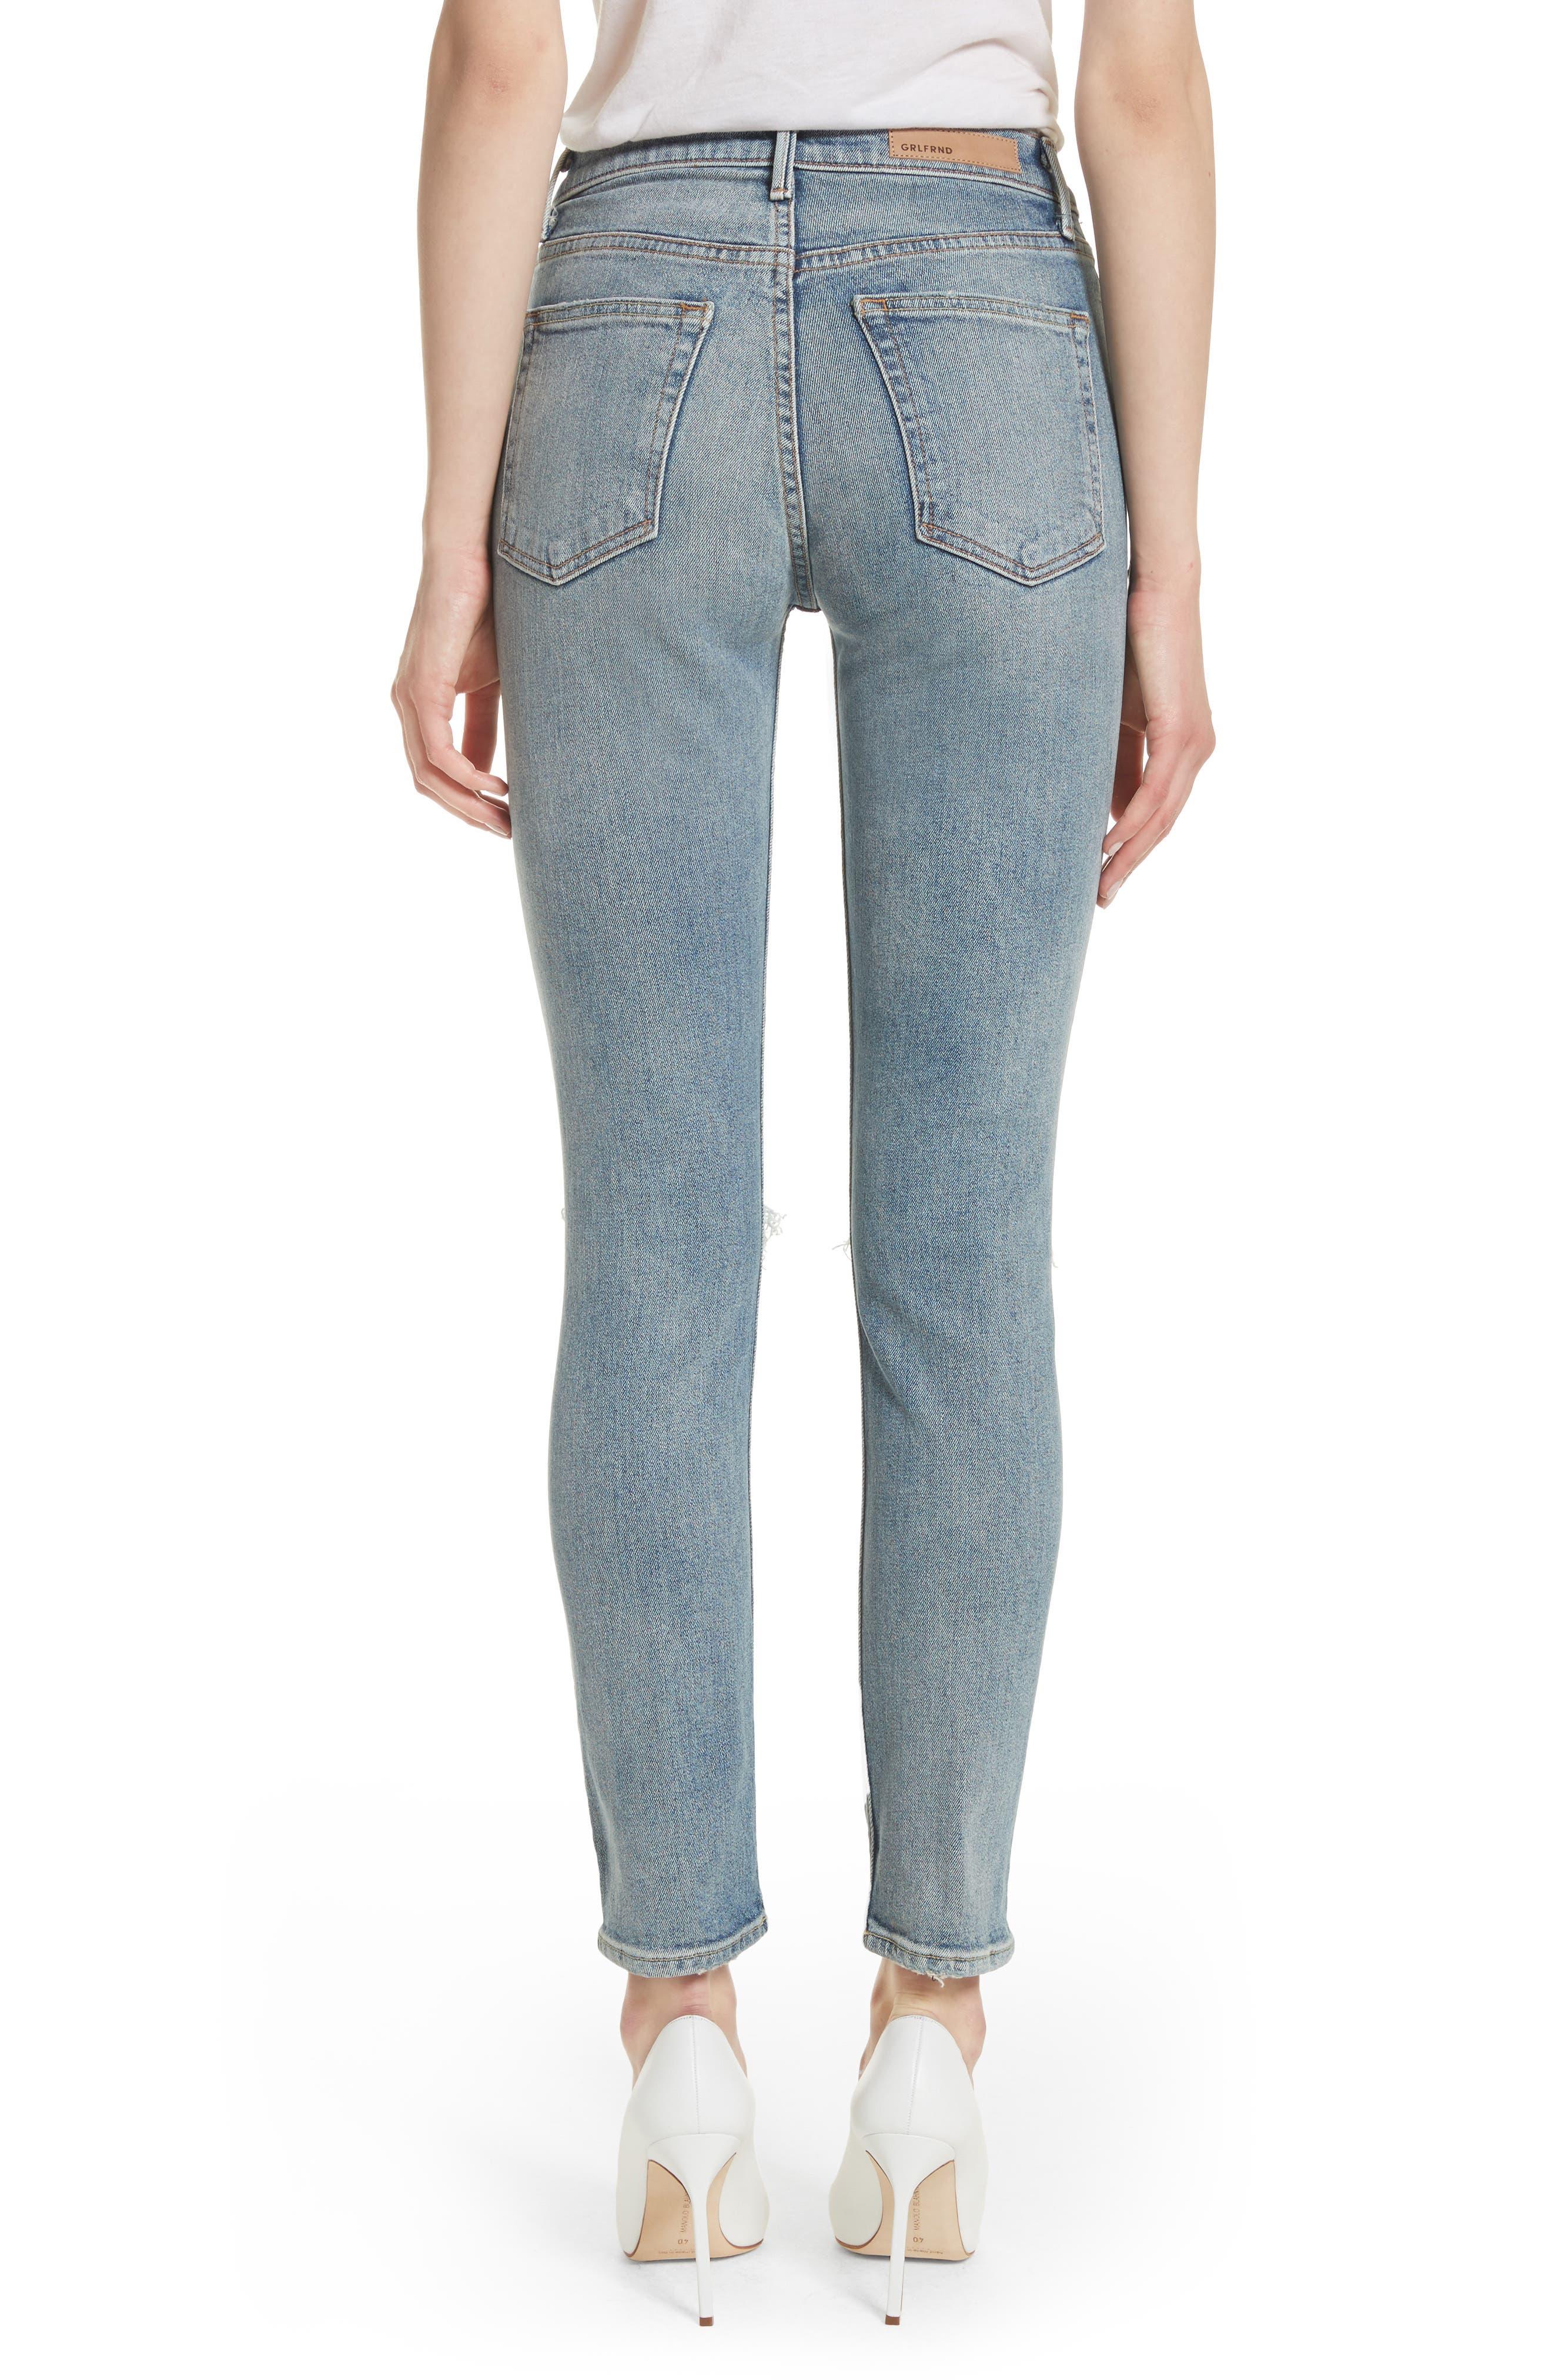 Karolina High Waist Jeans,                             Alternate thumbnail 2, color,                             WHAT IS LIFE